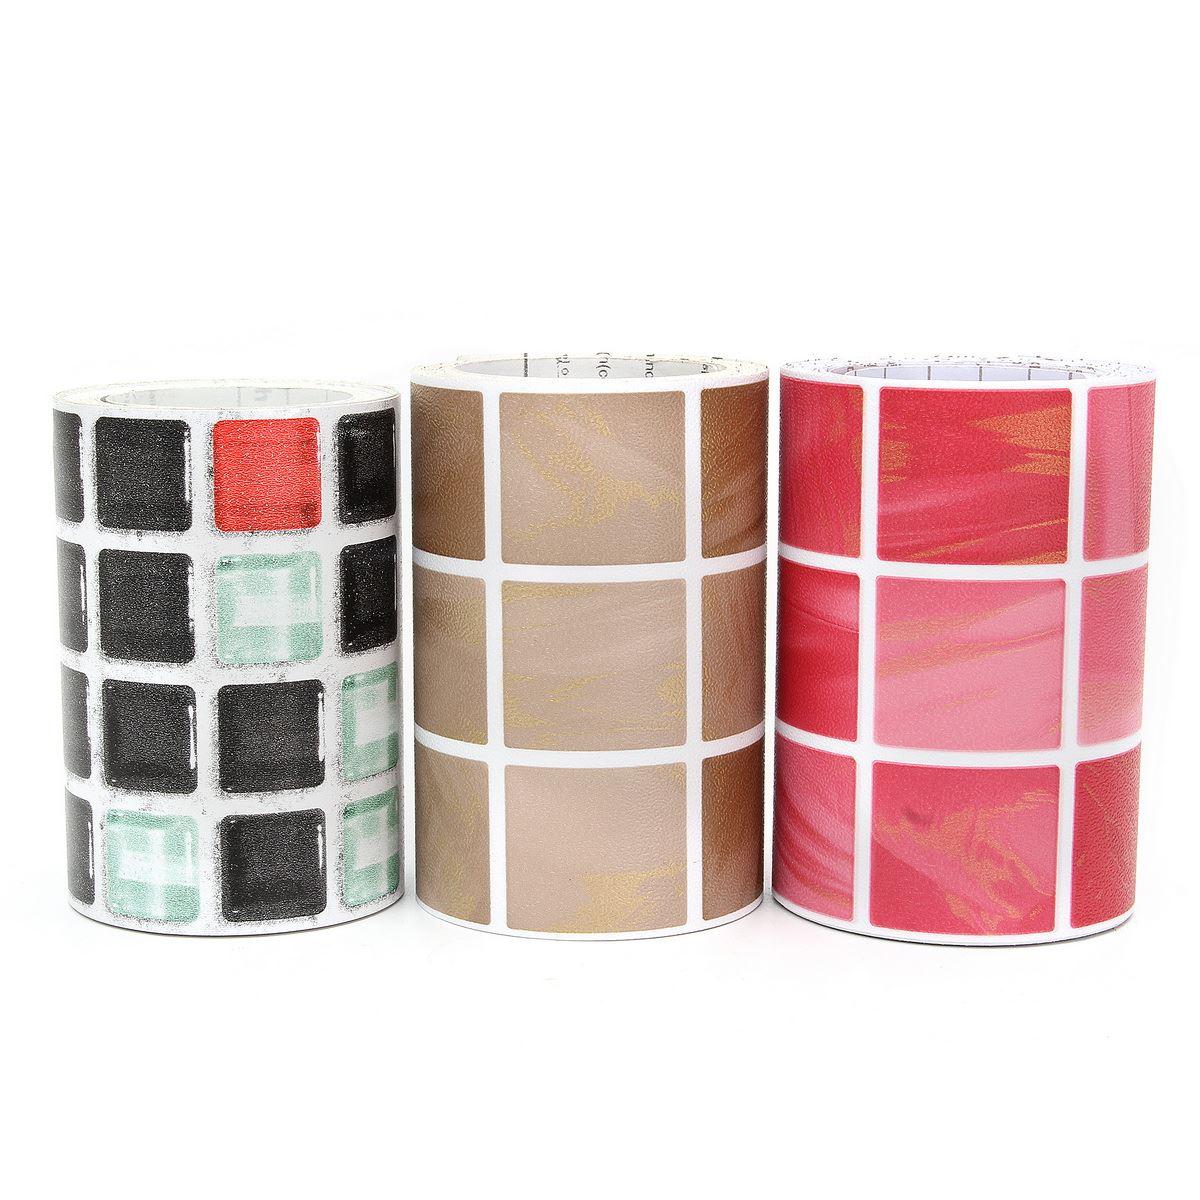 Kitchen Tile Decals Stickers Online Get Cheap Kitchen Tile Decal Aliexpresscom Alibaba Group